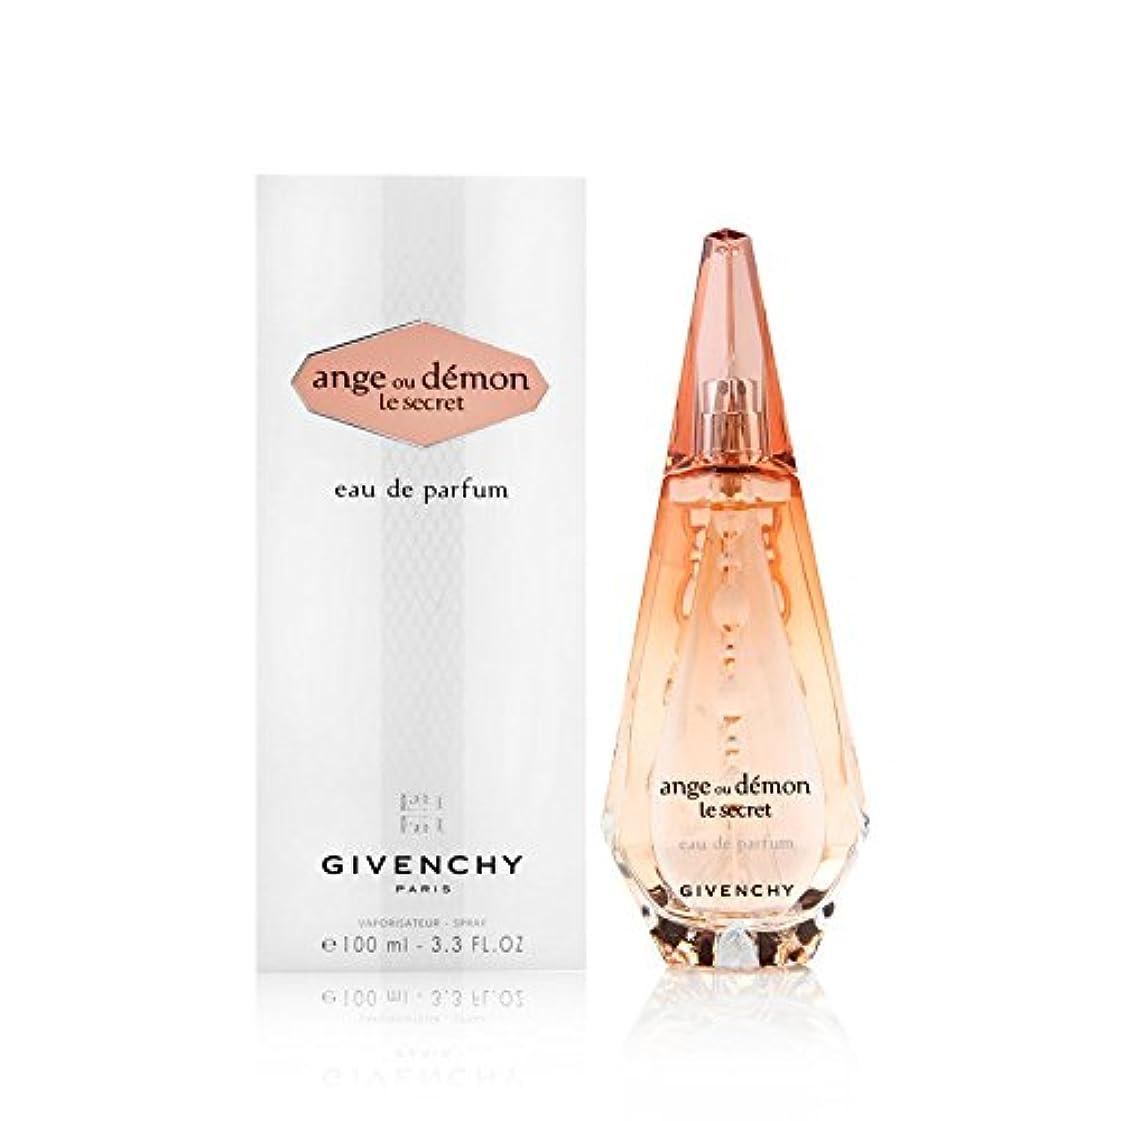 Givenchy - ANGE OU DEMON LE SECRET 100ミリリットルEDP VAPO - 【並行輸入品】